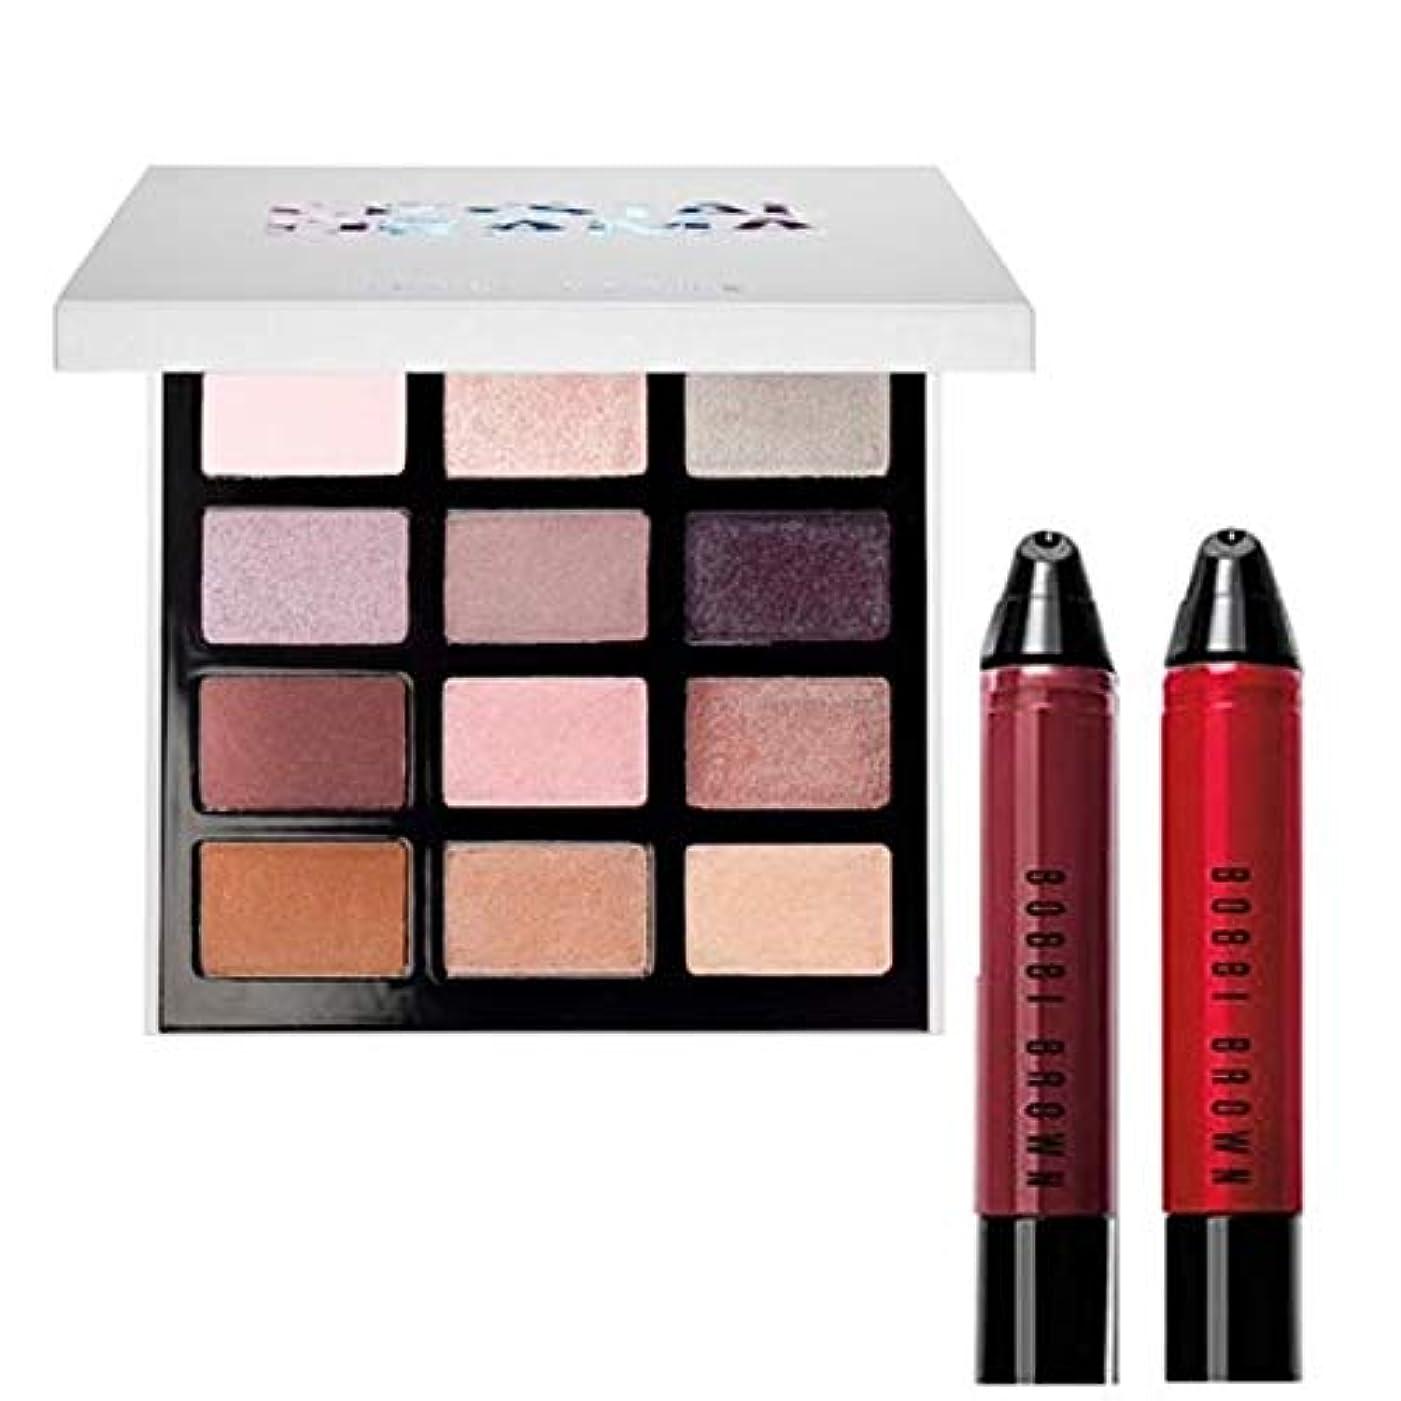 昇る談話帝国Bobbi Brown 限定版,Crystal Drama Eyeshadow Palette & Lip Art Mini Art Stick Liquid Lip 2Set [海外直送品] [並行輸入品]